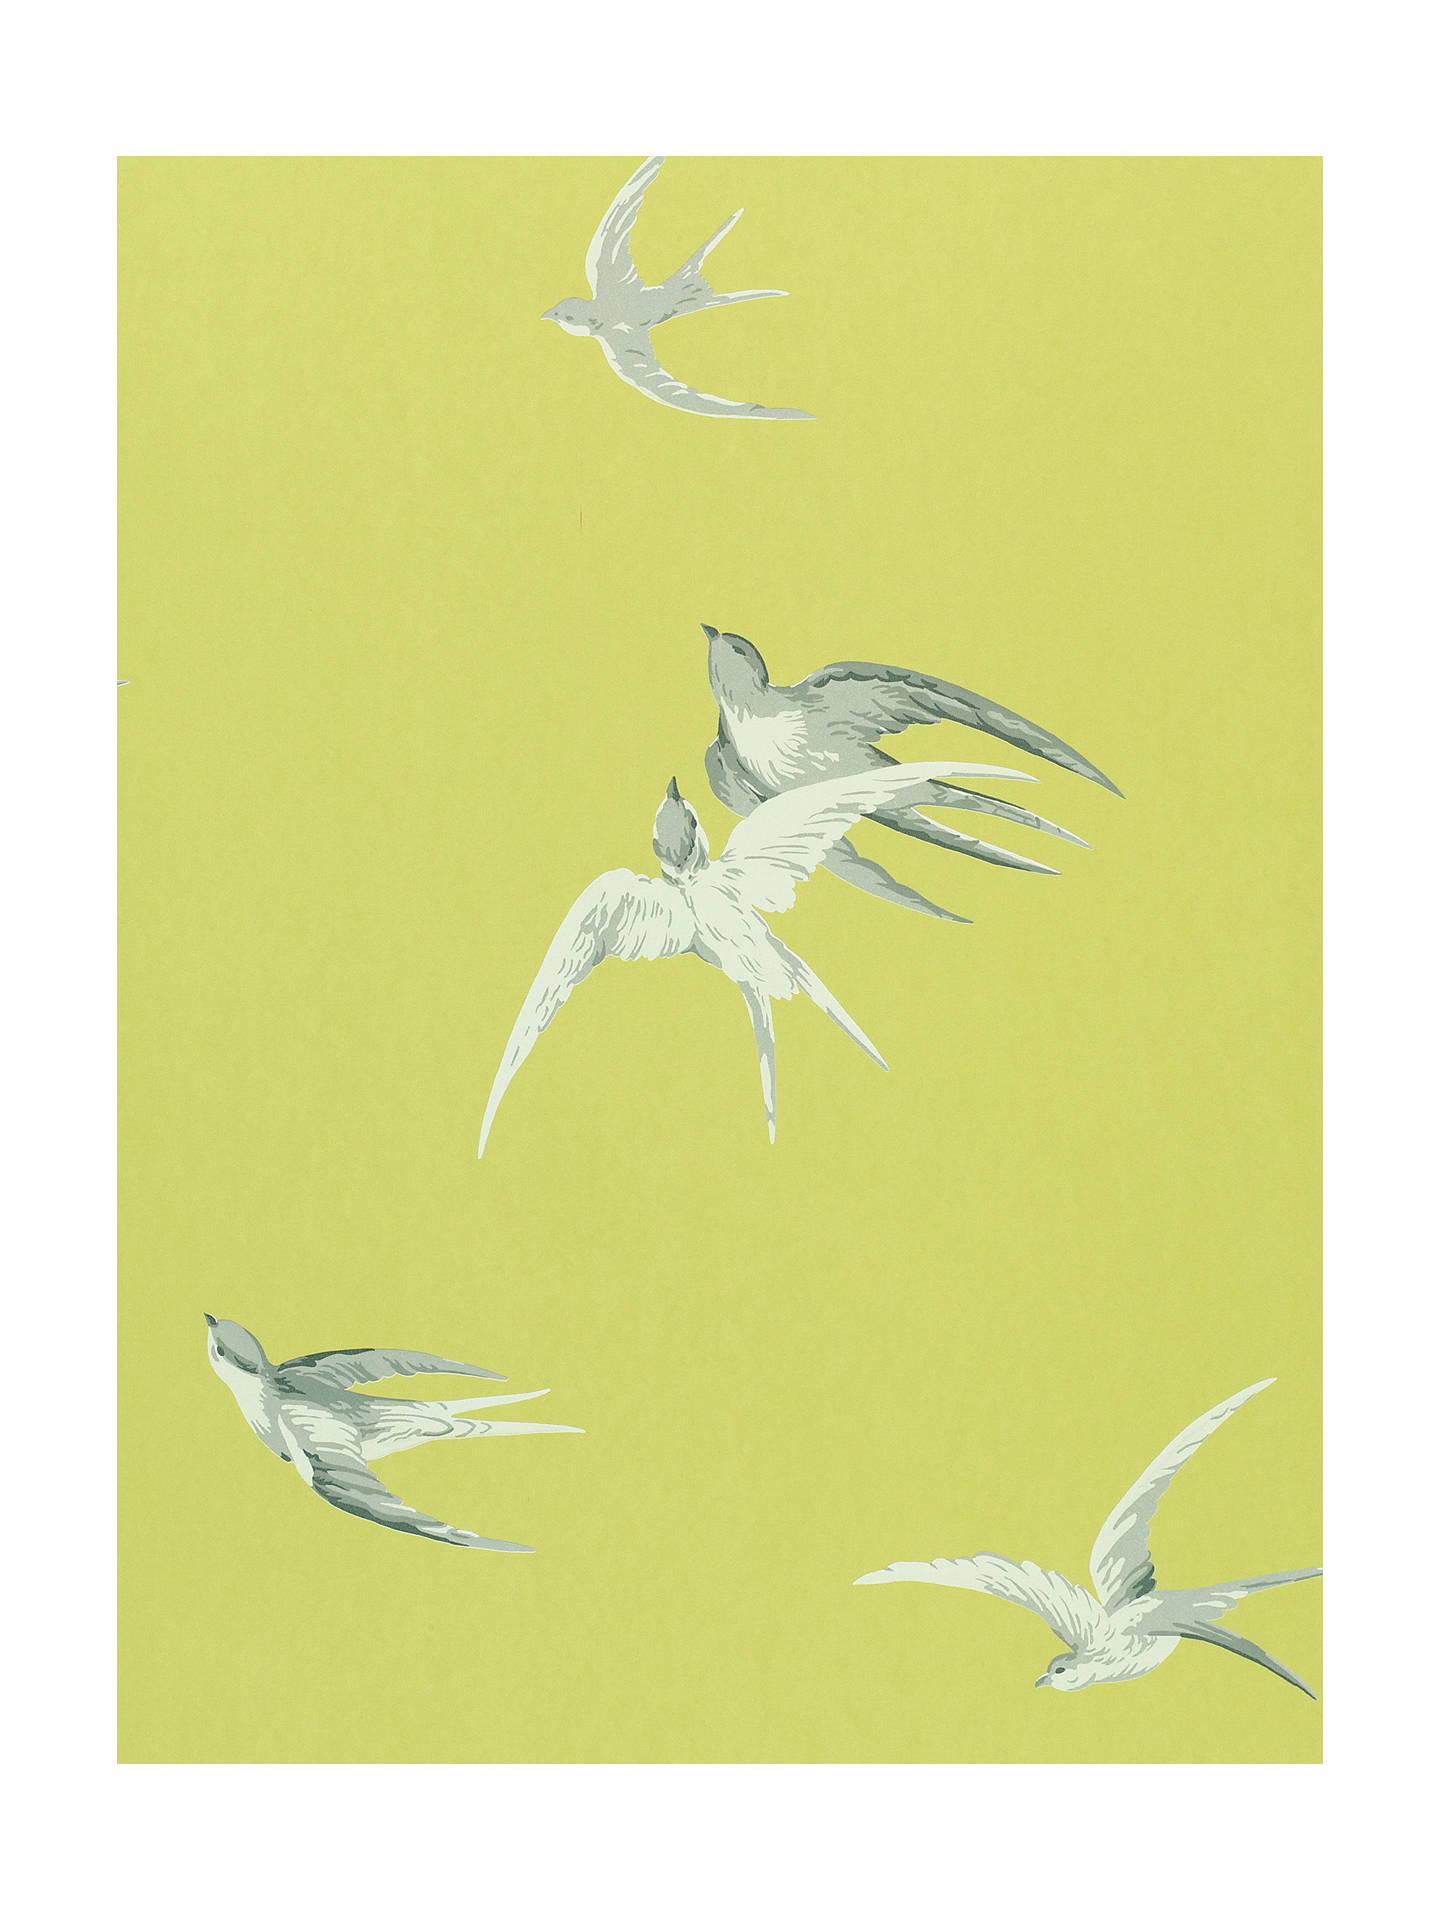 Sanderson swallows wallpaper at john lewis partners - Sanderson swallows wallpaper pebble ...